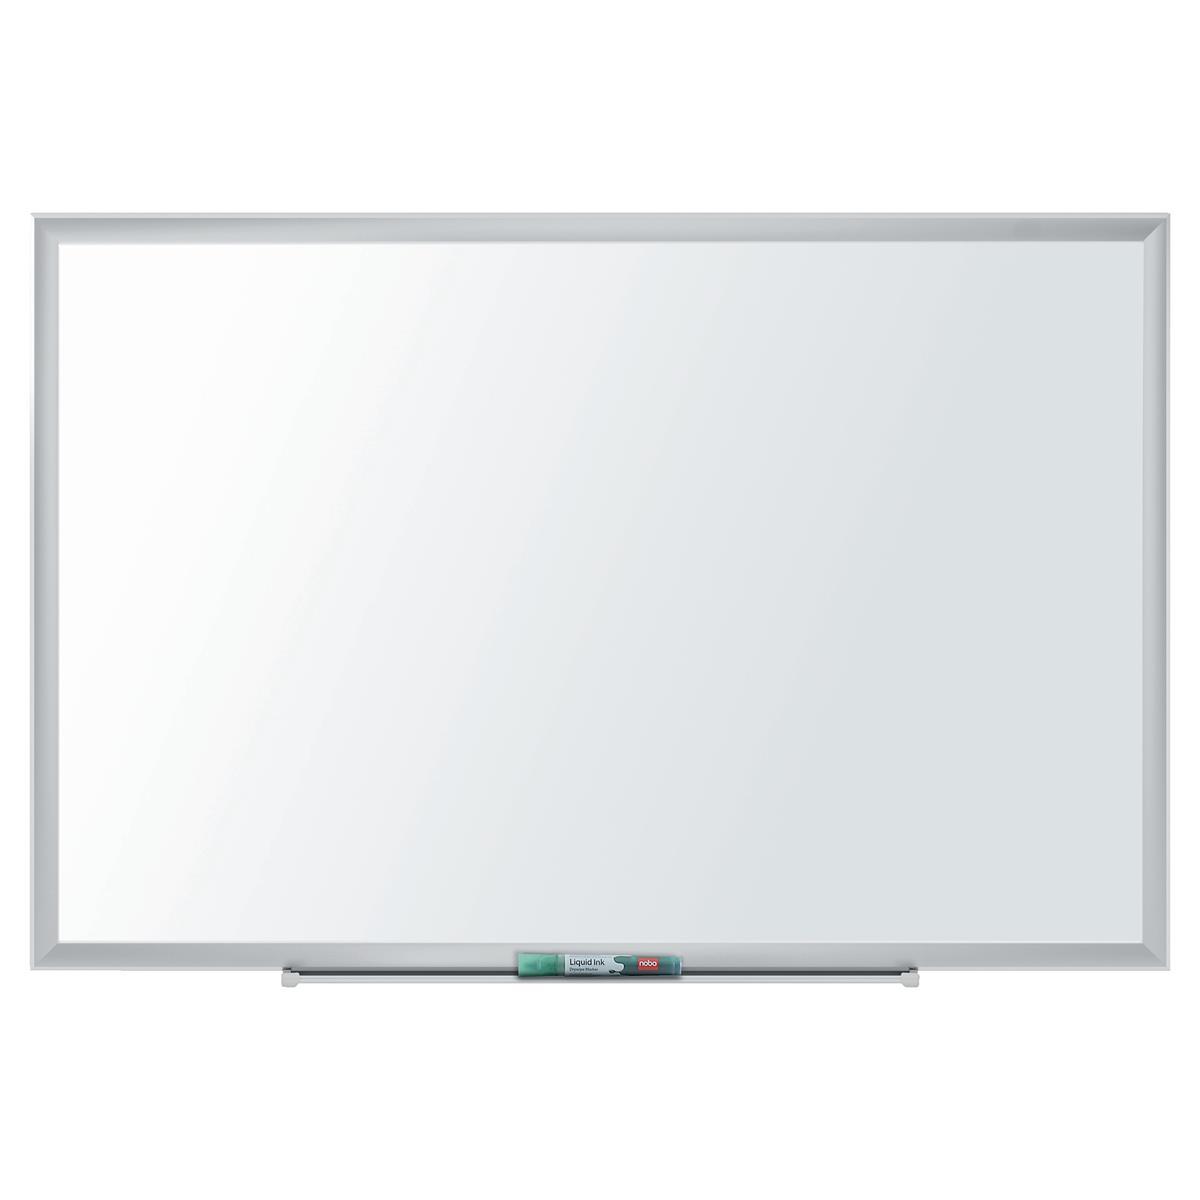 Nobo Nano Clean Steel Whiteboard Magnetic Exclusive Nano Clean Surface W1500xH1000mm White Ref 1905169